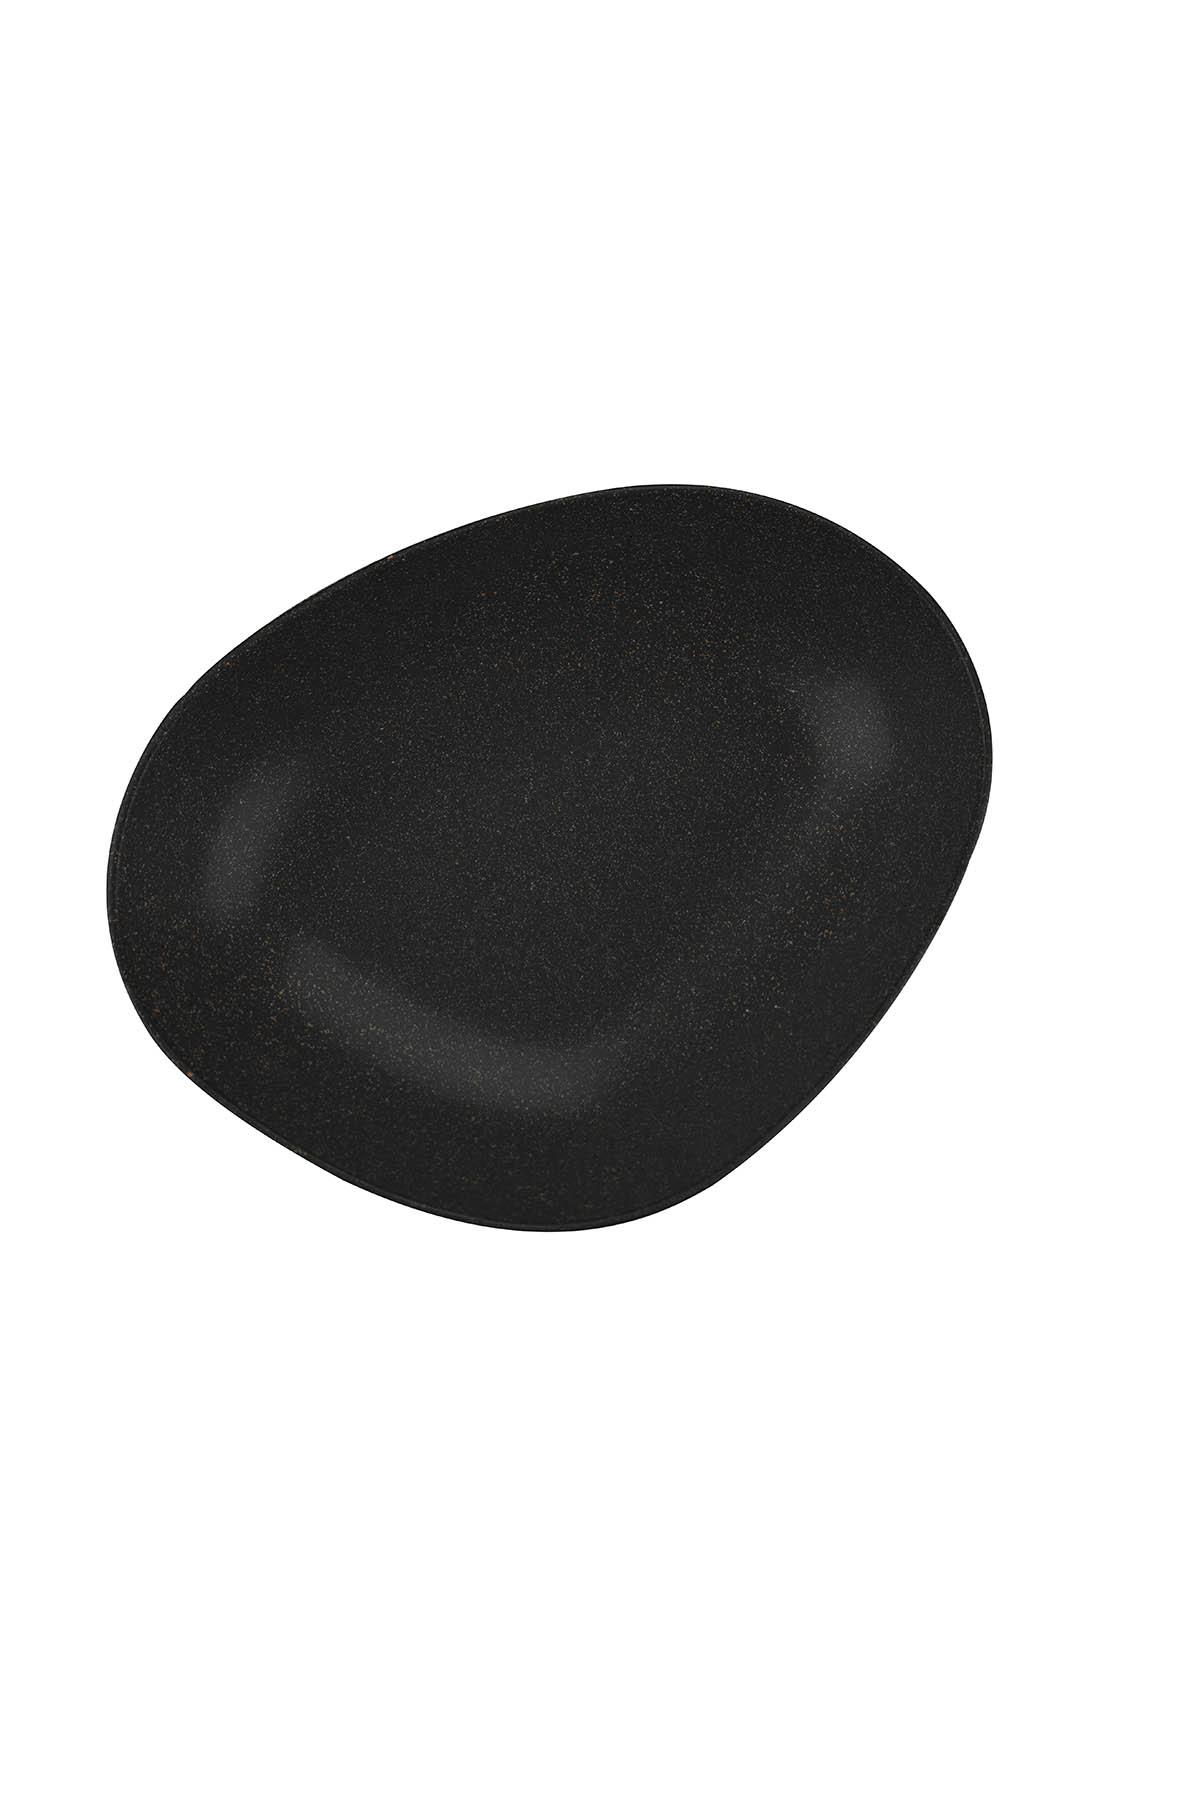 Corendon - Galaxy 2 Li 20 Cm Cukur Tabak Mat Antrasit Renk